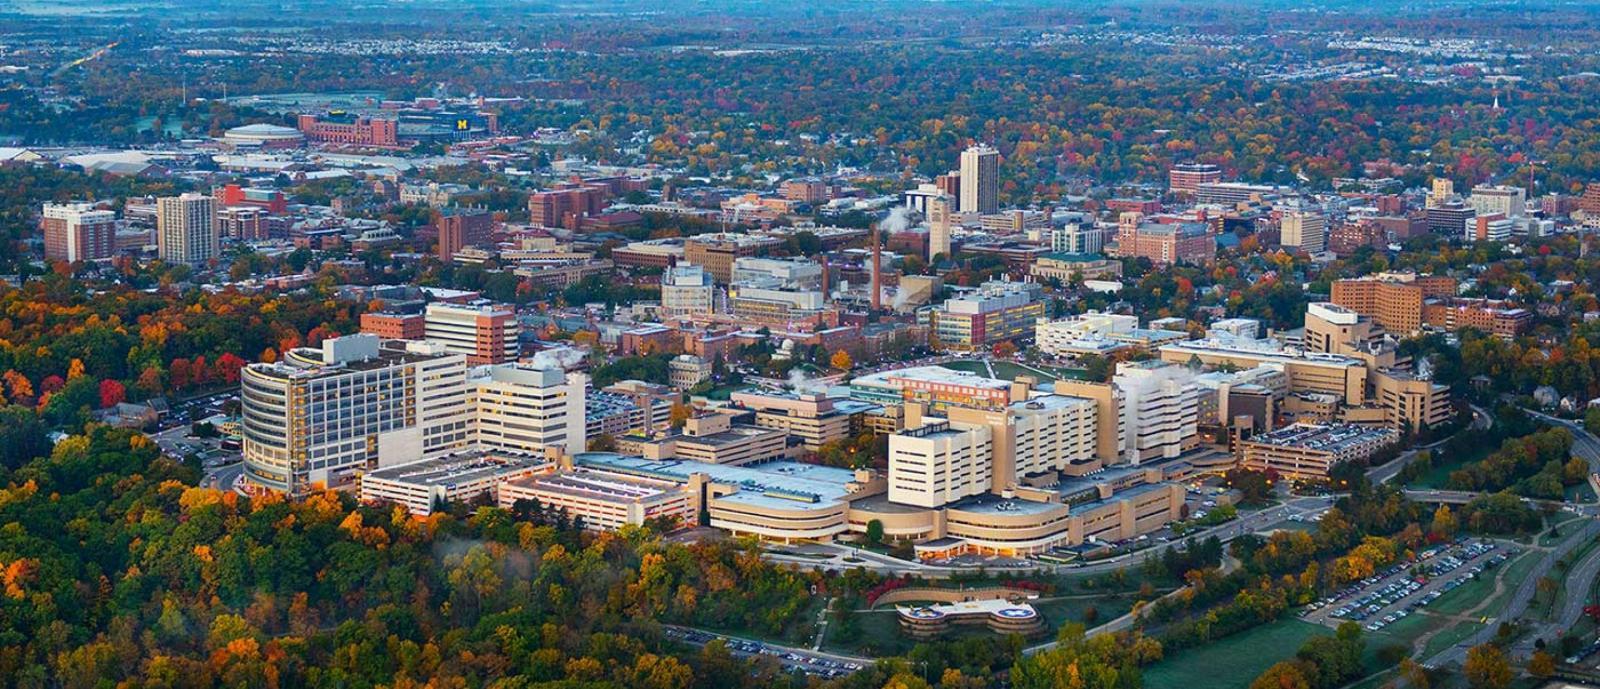 Aerial of Michigan Medicine